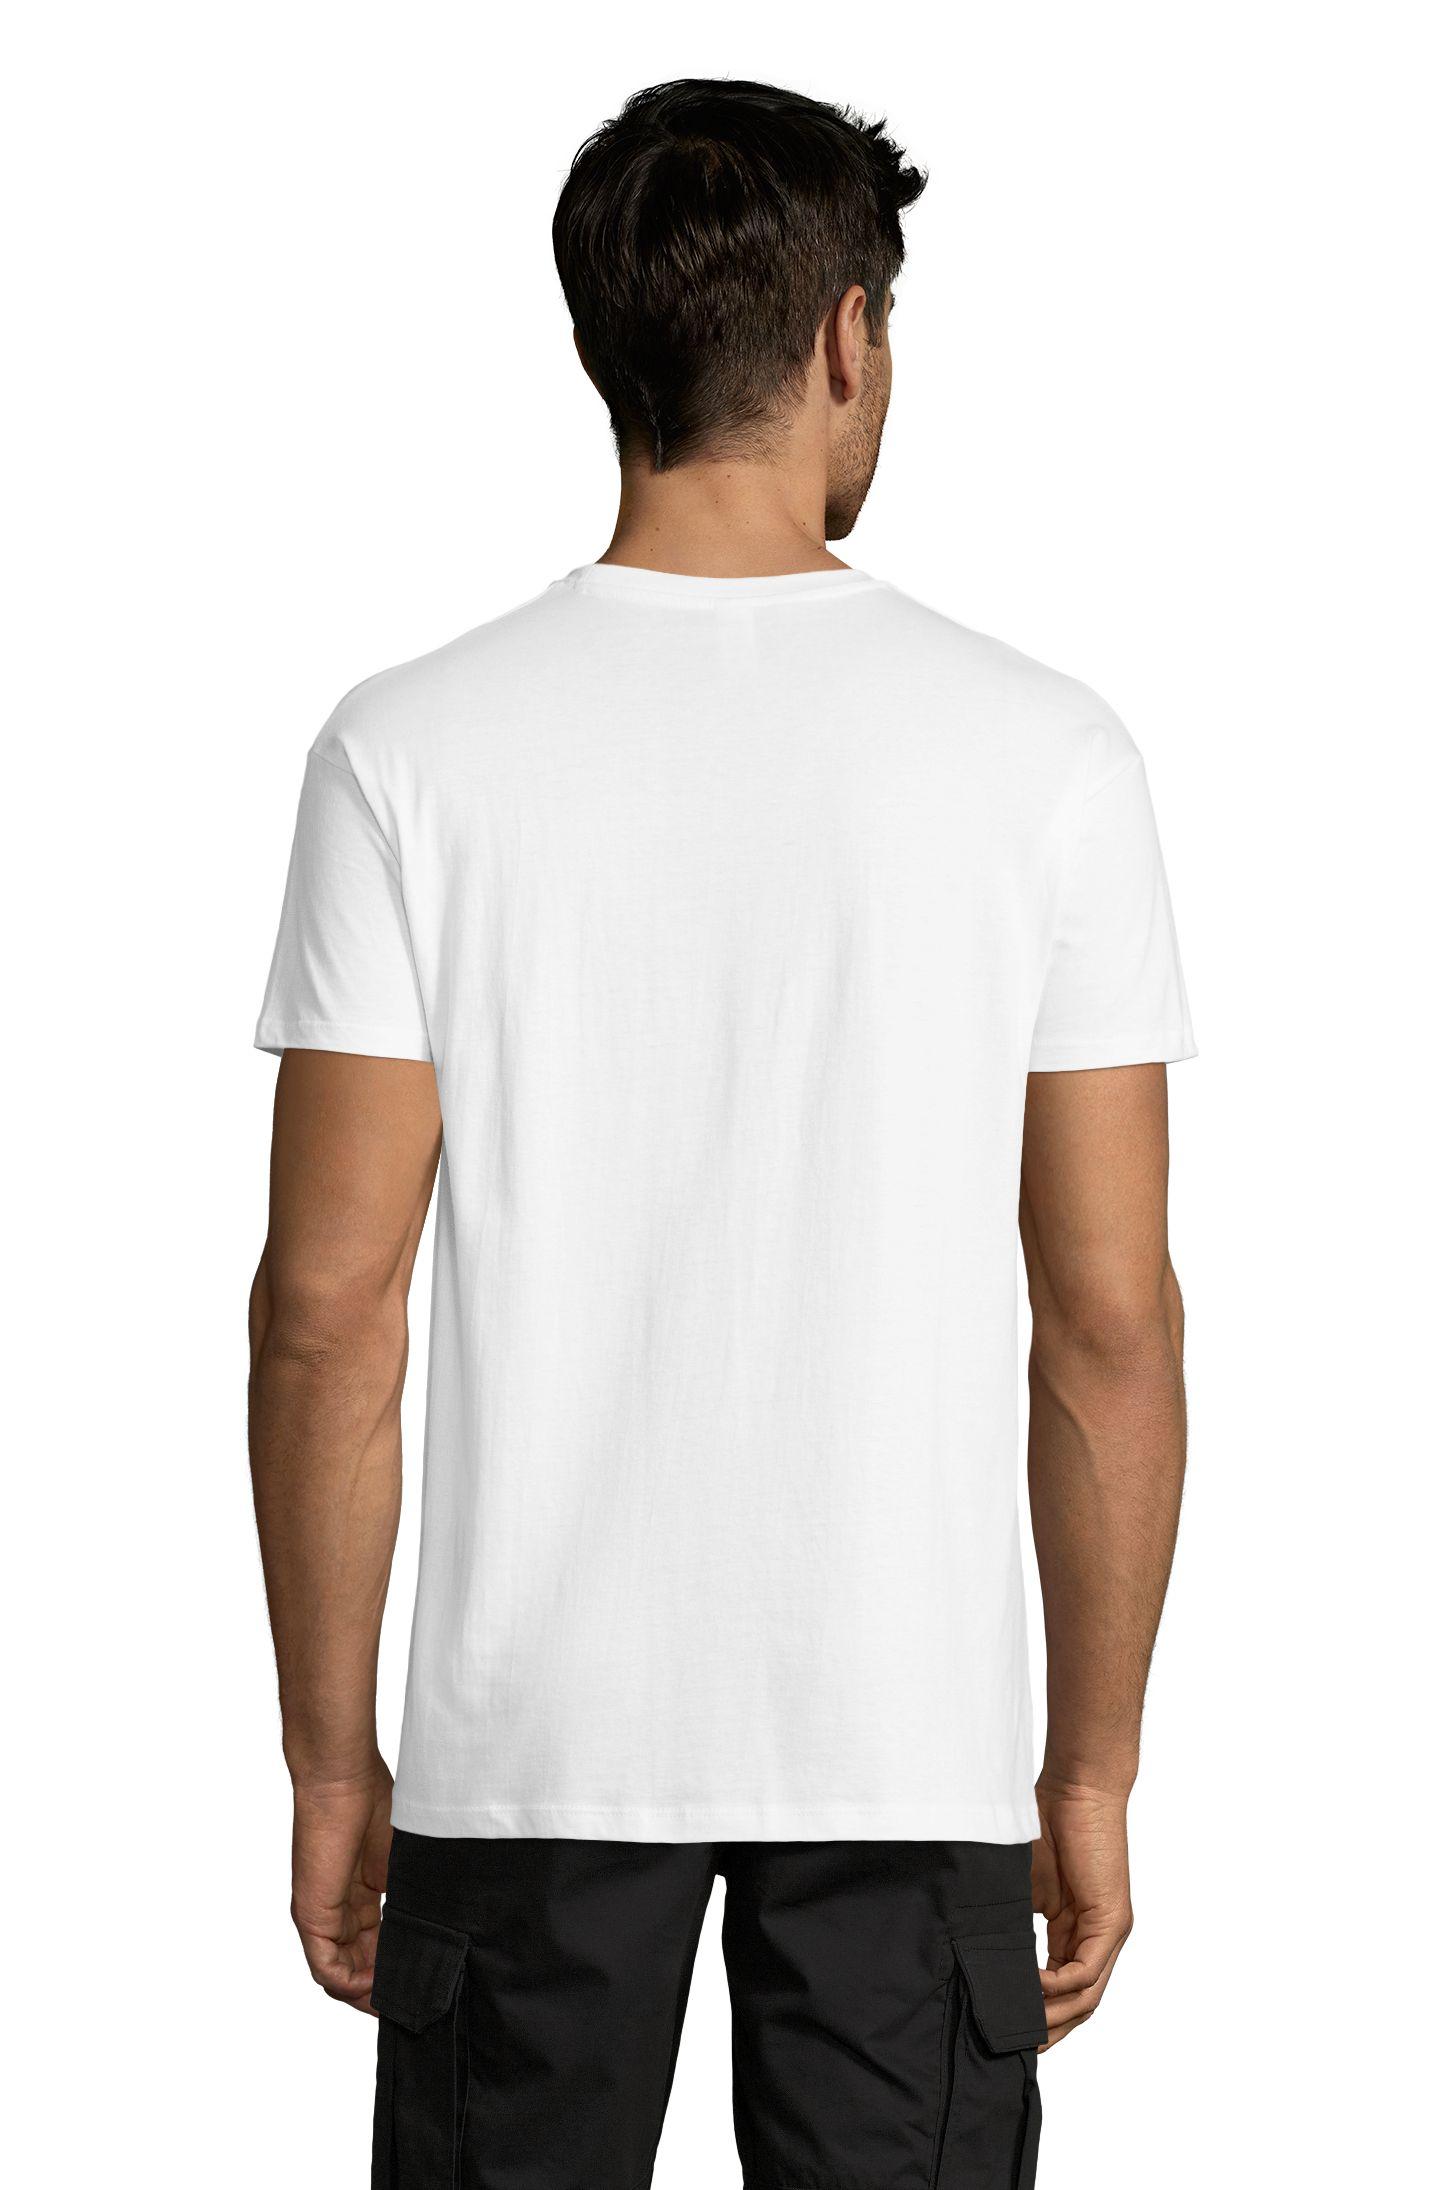 102 - White